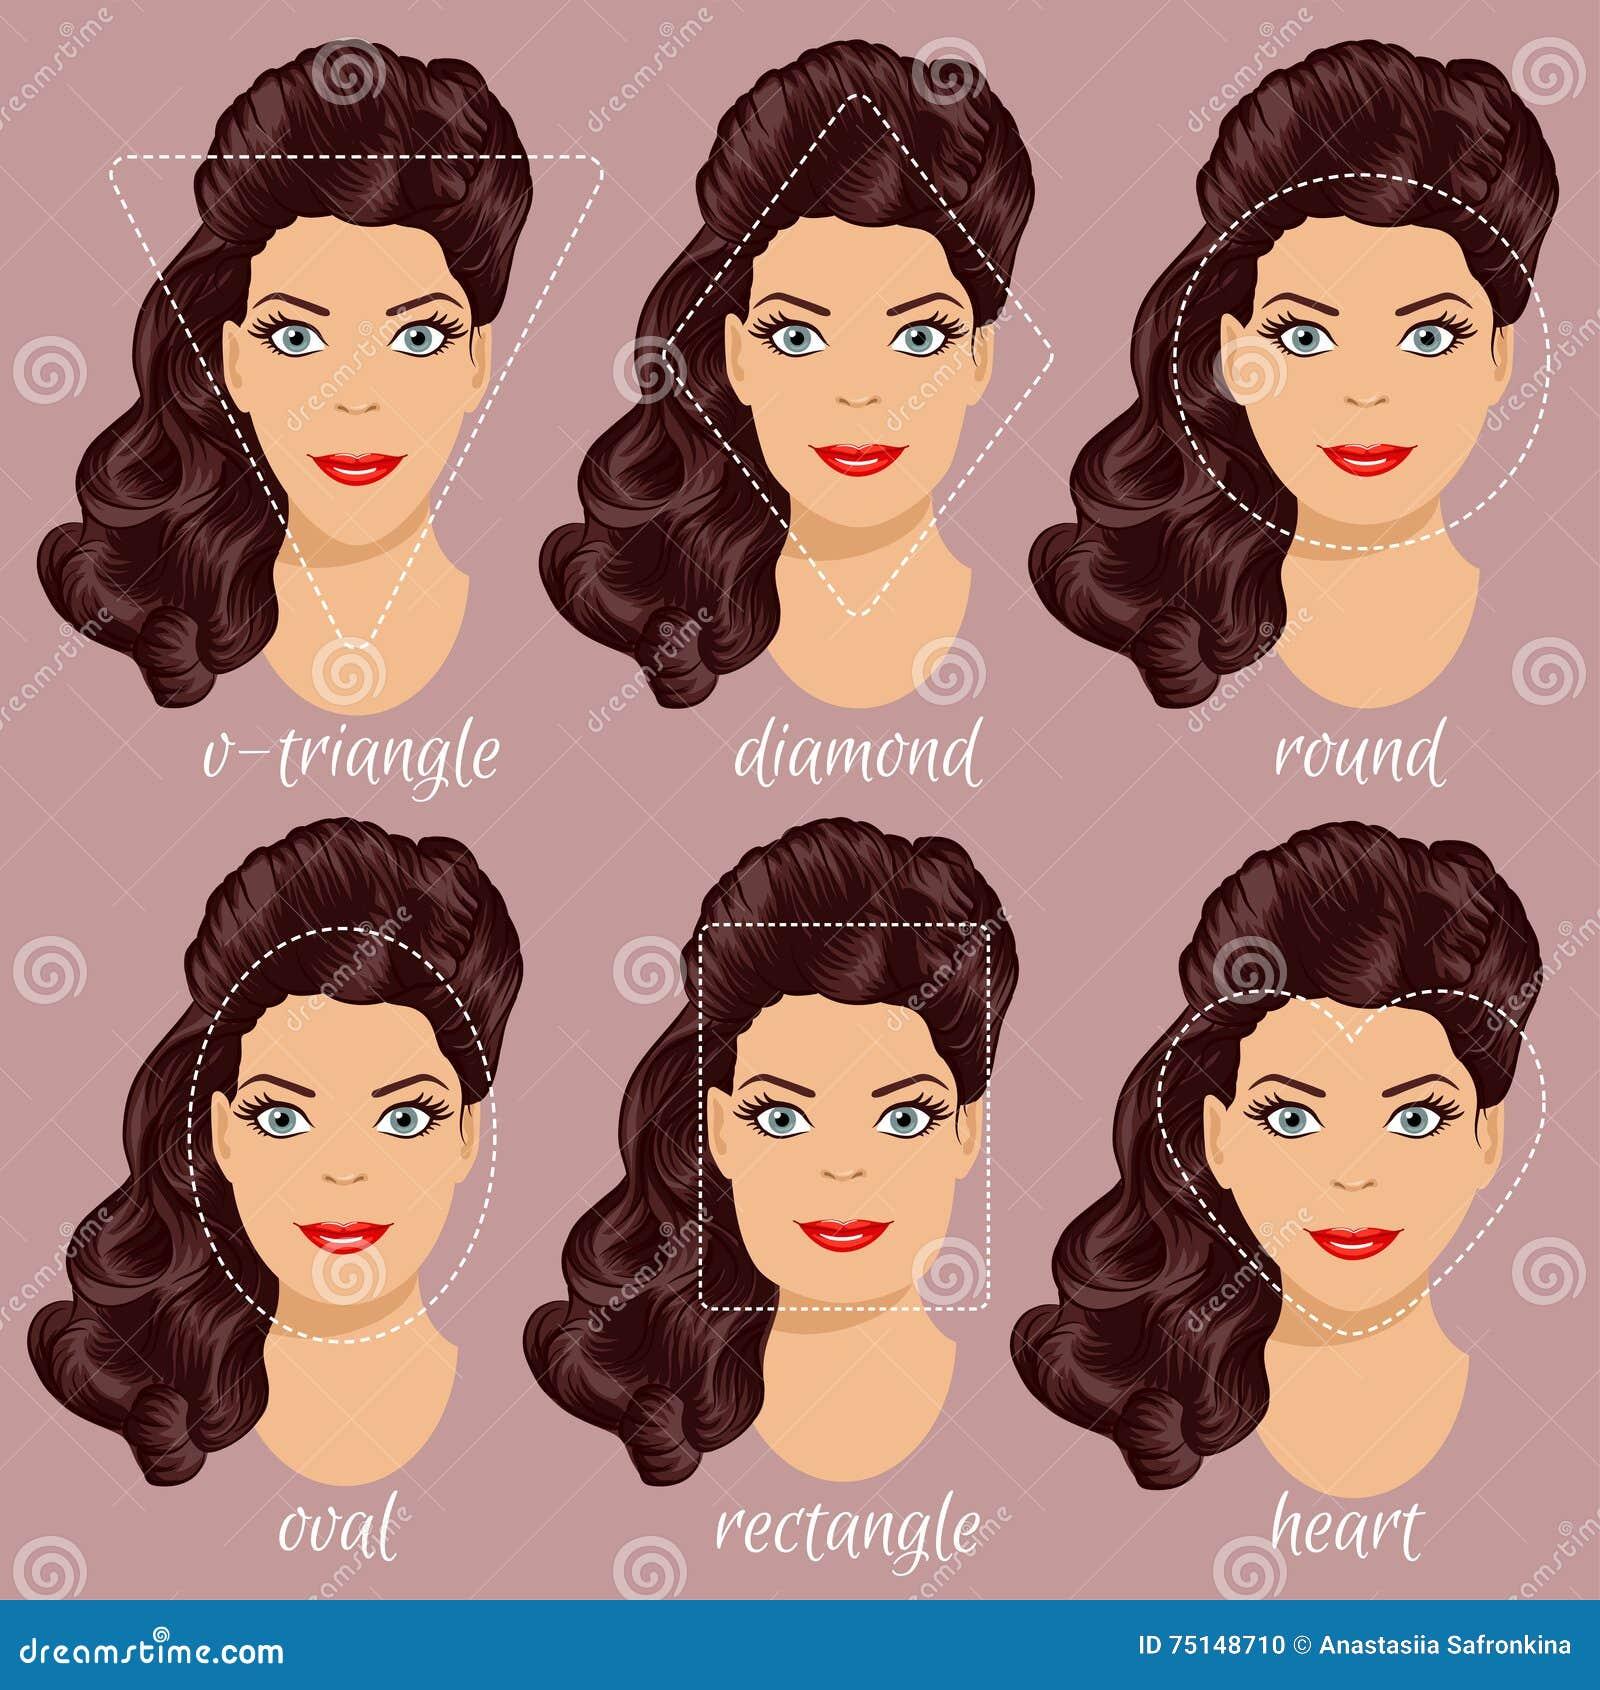 Woman Face Shape Types Cartoon Vector | CartoonDealer.com ...  Woman Face Shap...